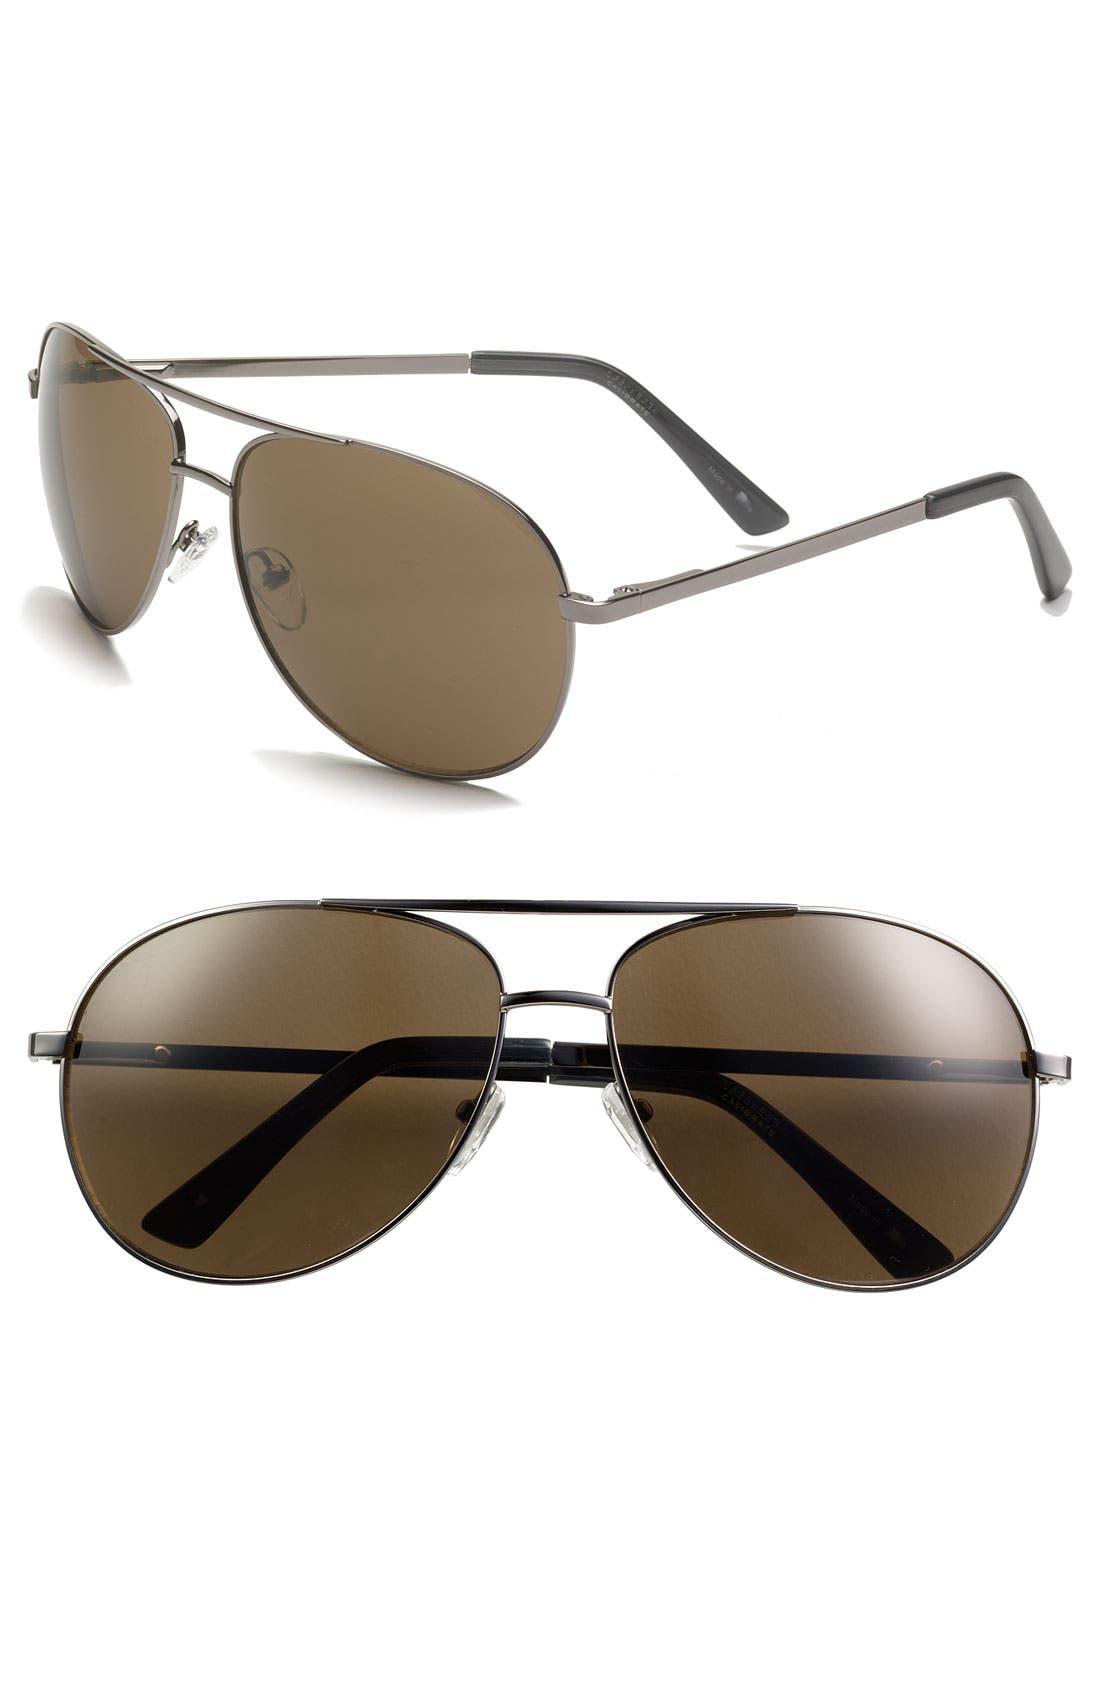 Main Image - Calibrate Aviator Sunglasses